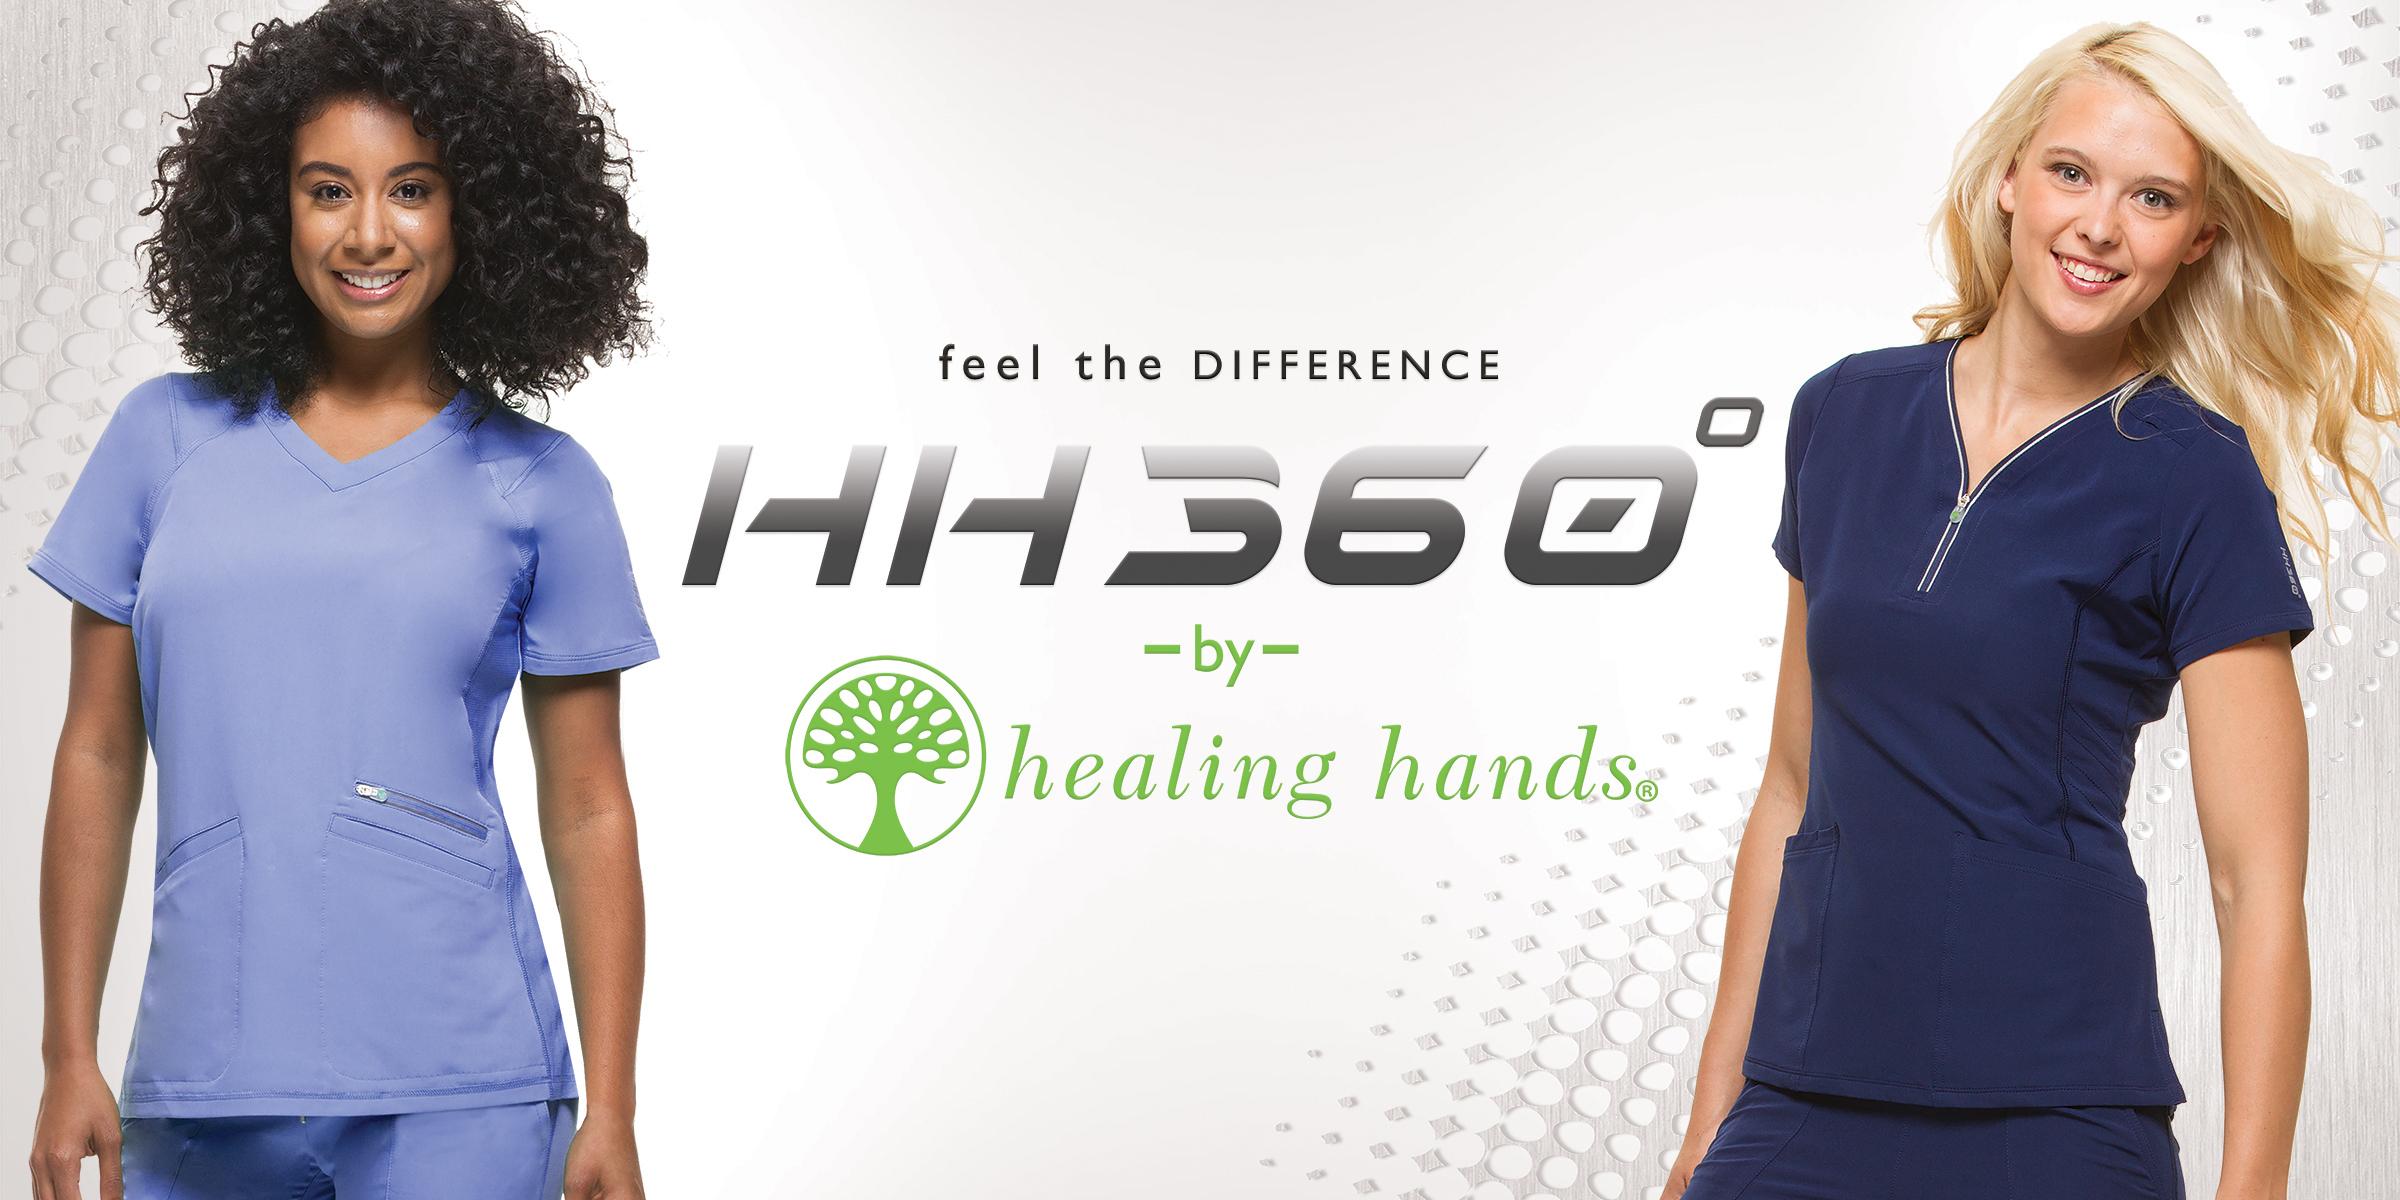 hh360-web-banners-2.jpg